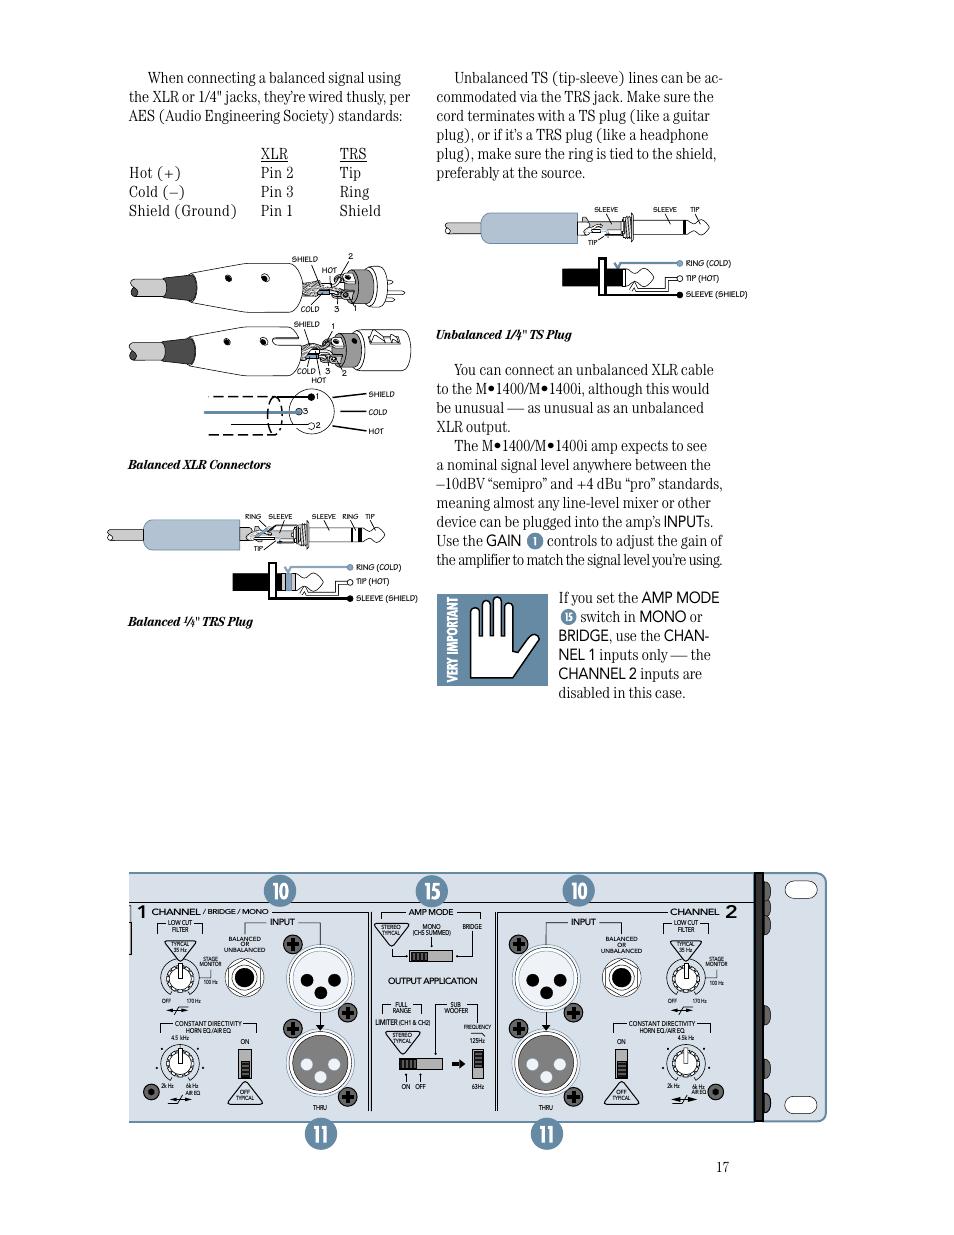 hight resolution of speaker outputs unbalanced 1 4 ts plug balanced xlr connectors balanced